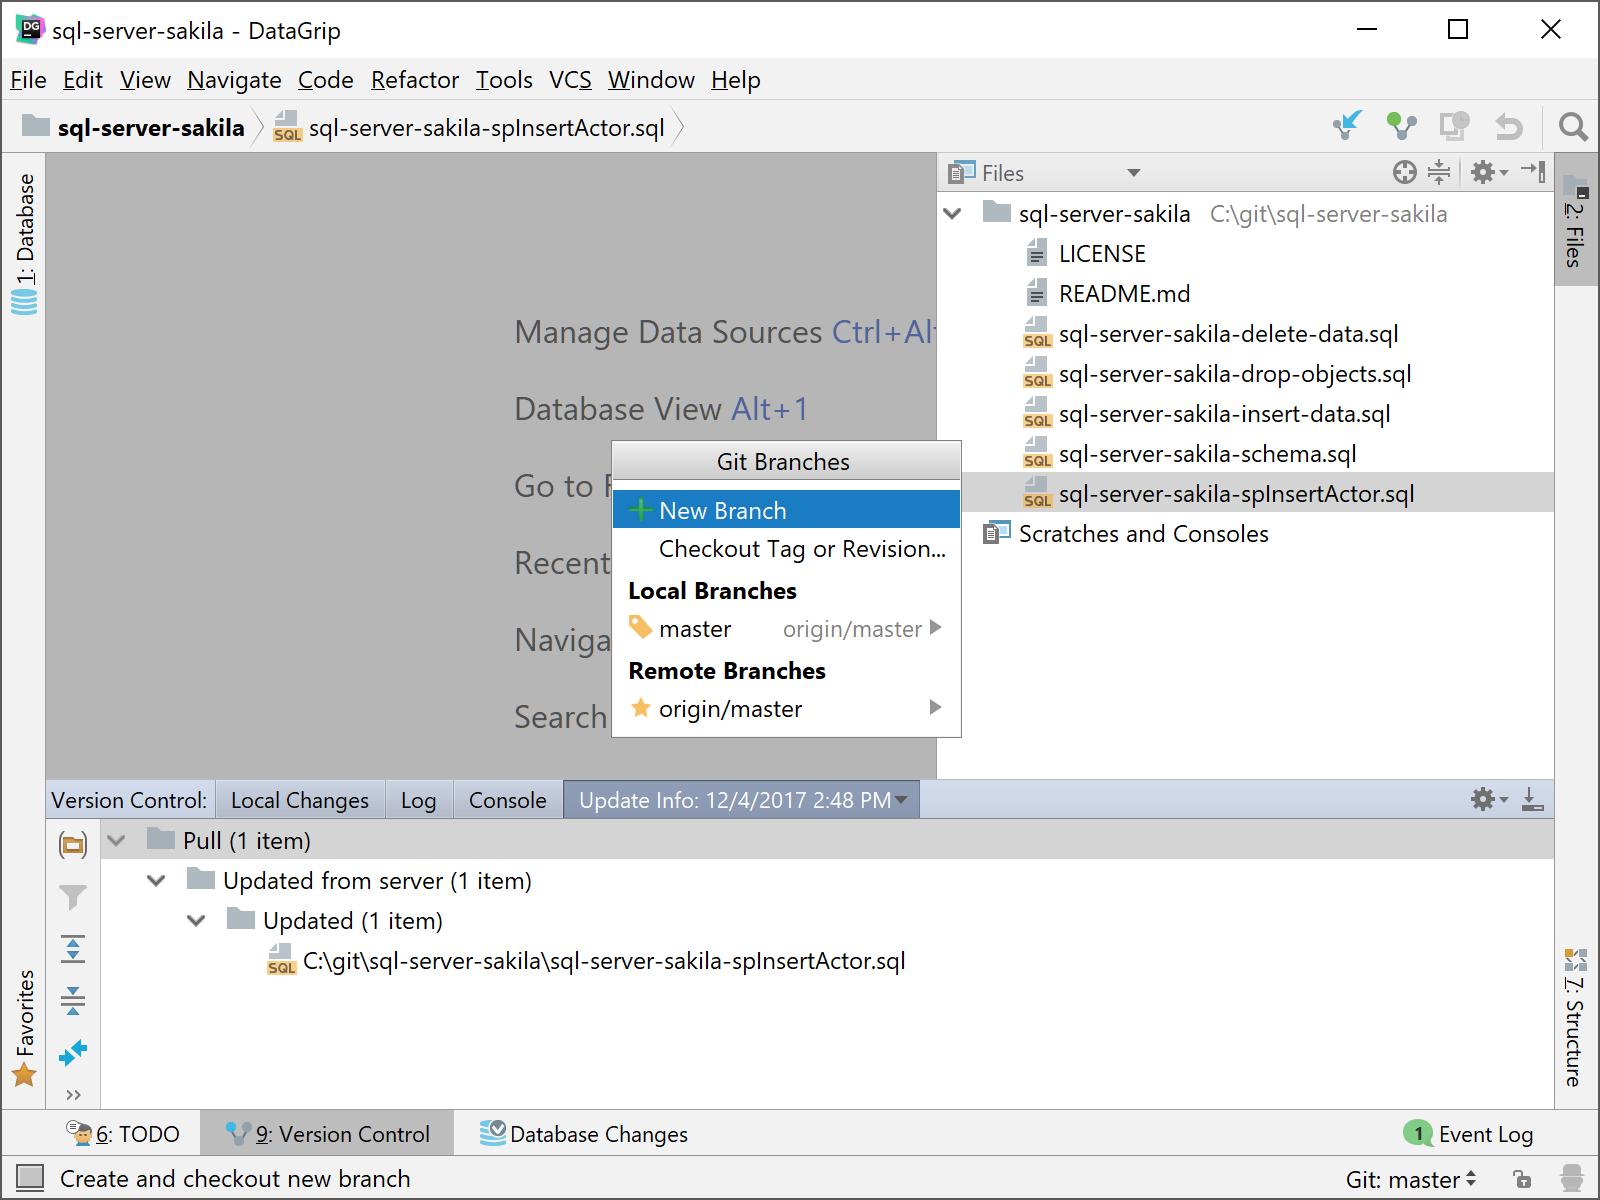 DataGrip Git Branches popup